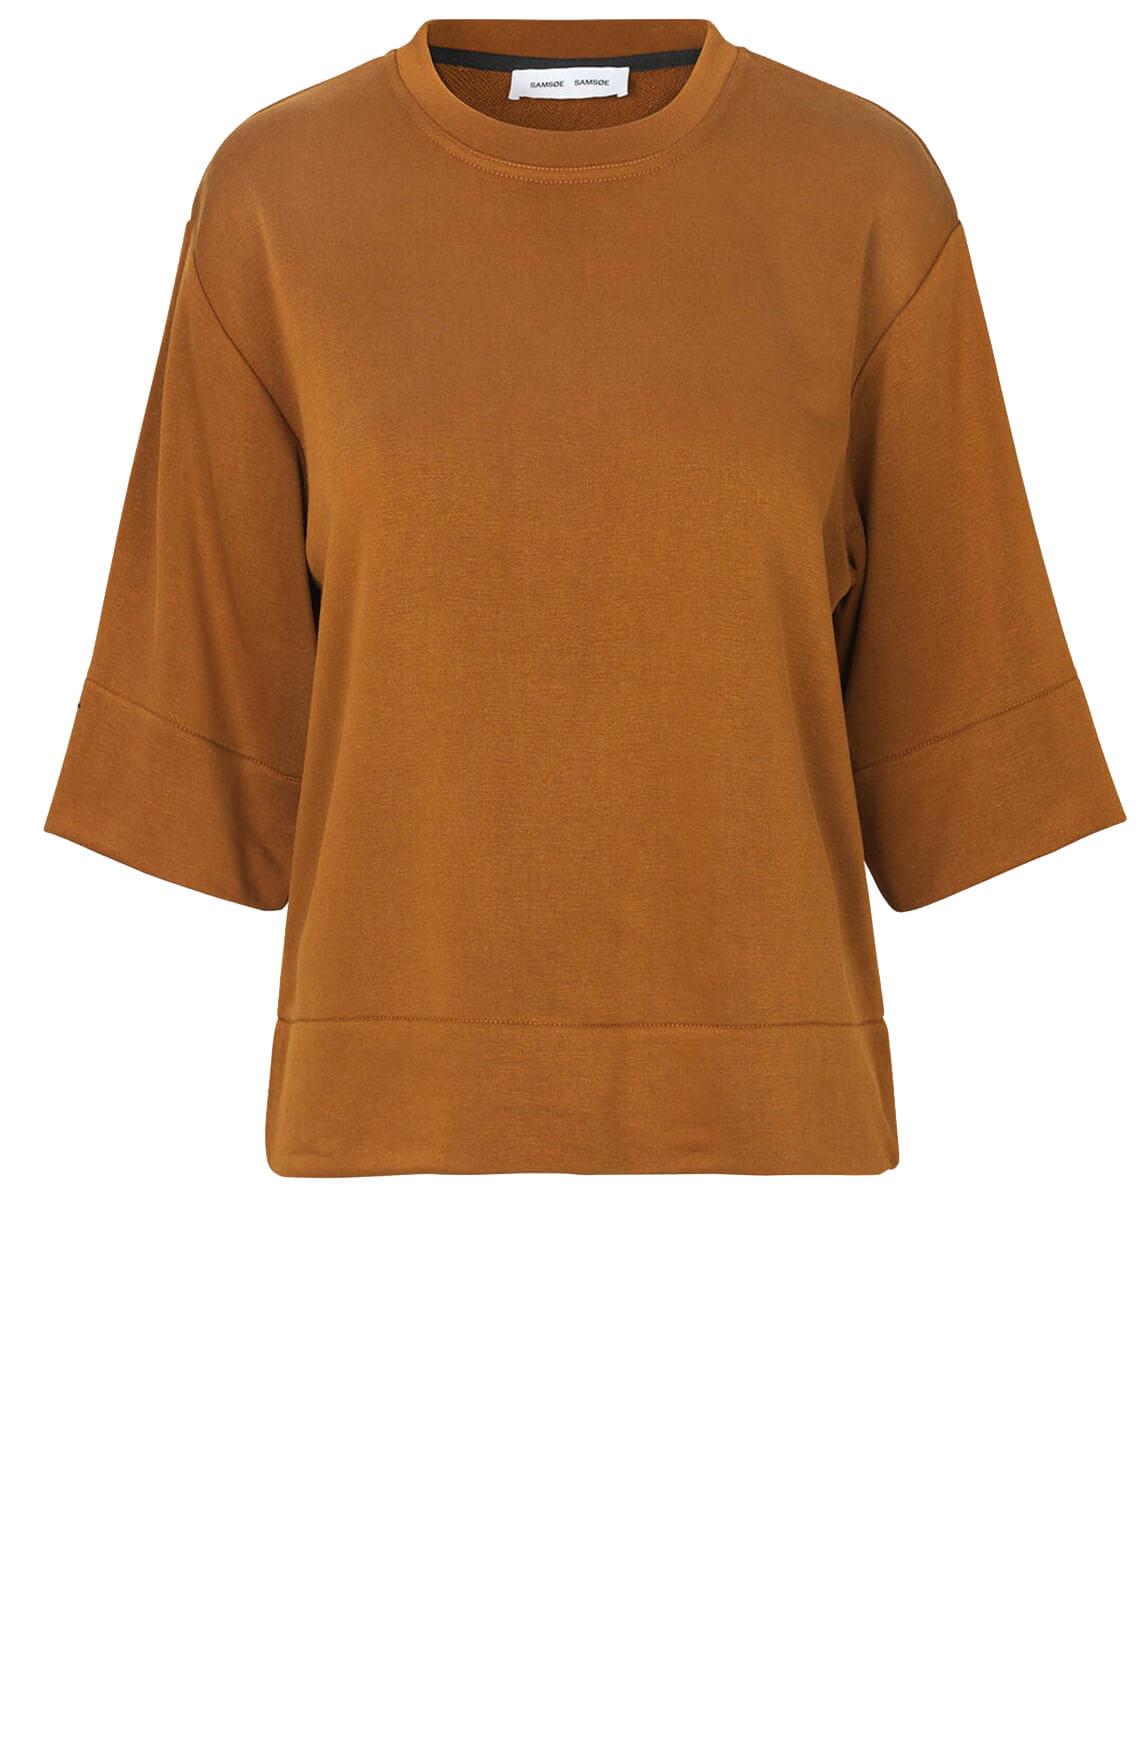 Samsoe Samsoe Dames Cira sweatshirt Bruin